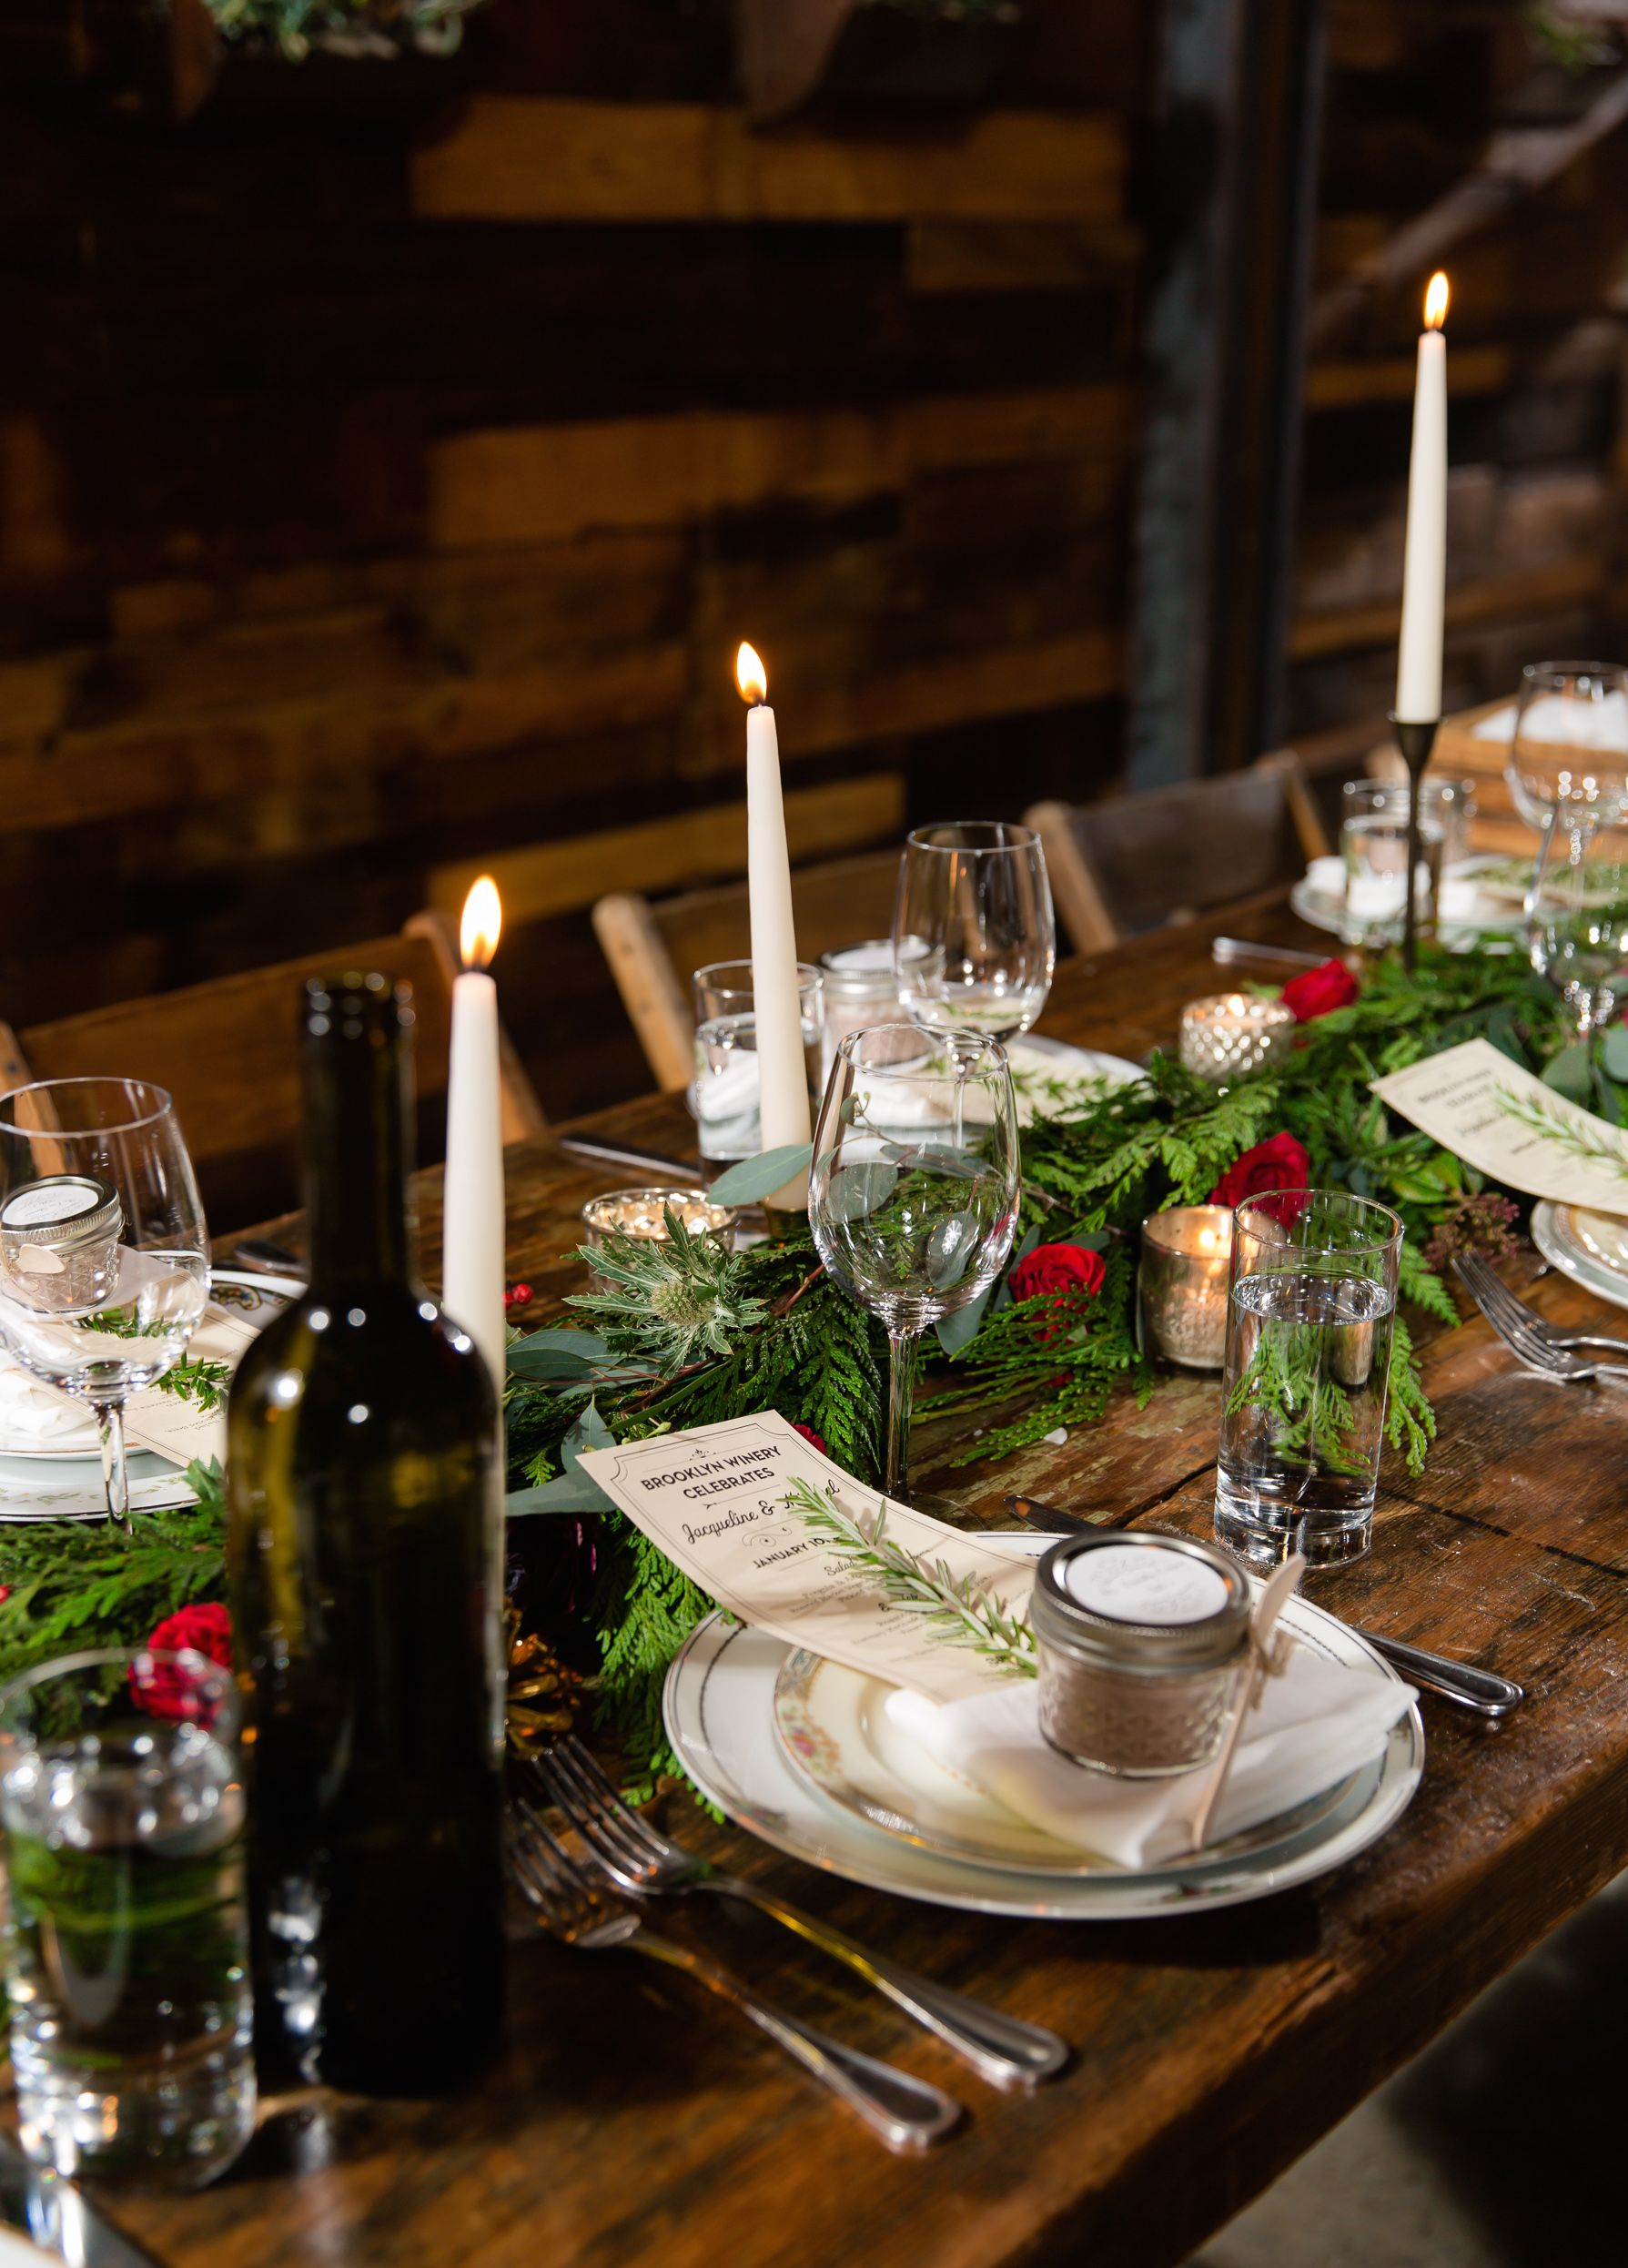 20 best christmas table centerpieces easy ideas for holidayCenterpiece Christmas Table #11